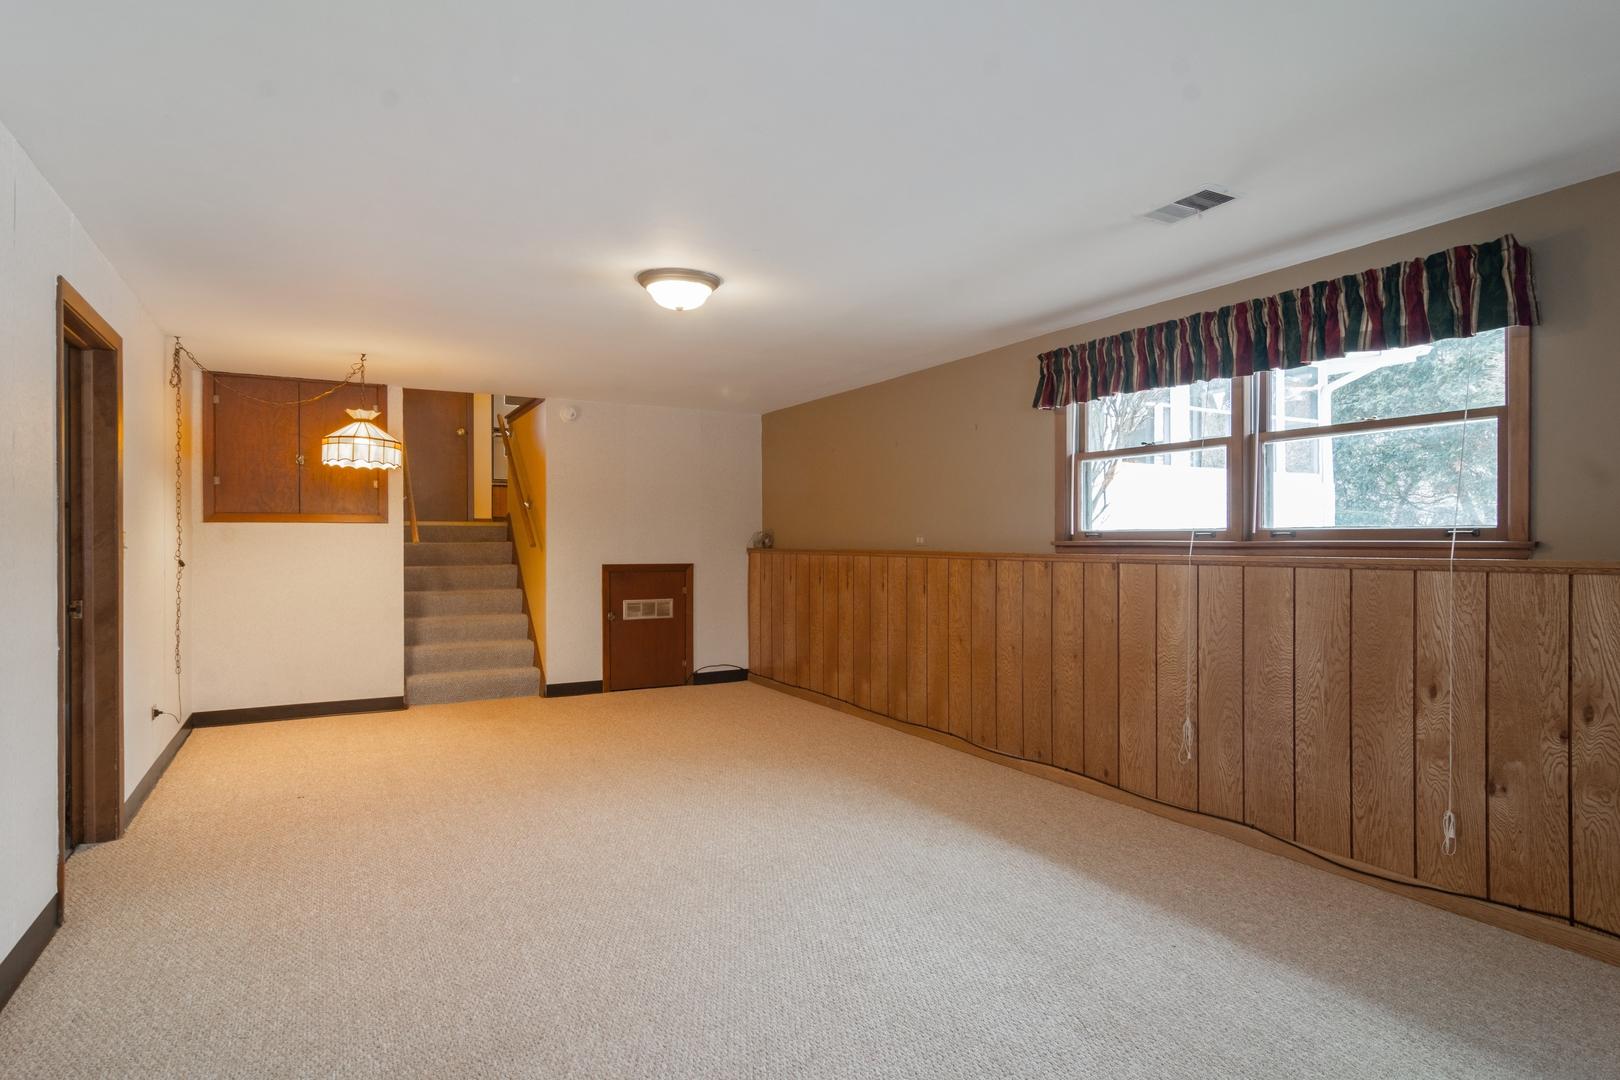 1302 West Lincoln, Mount Prospect, Illinois, 60056